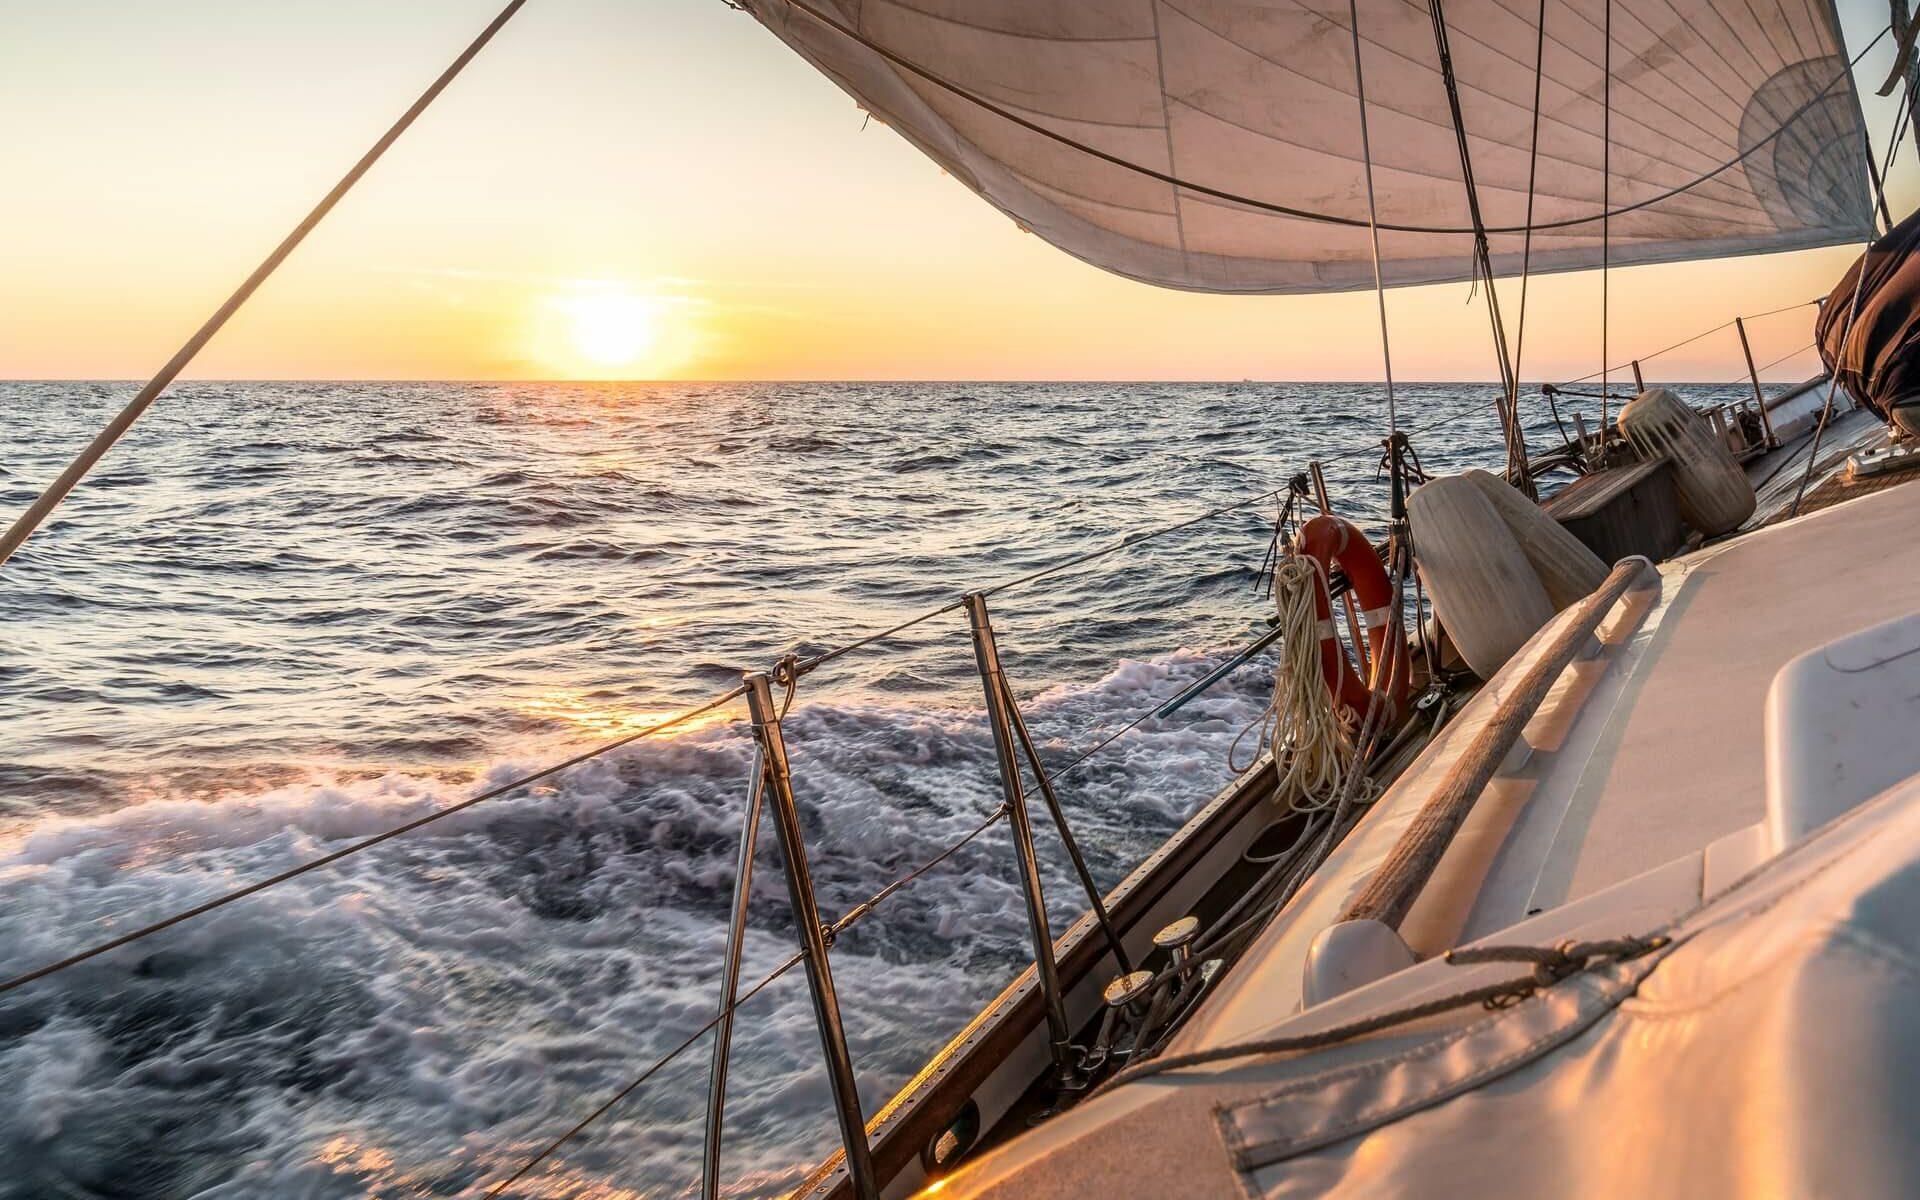 sailing around the world on a single hull sailboat